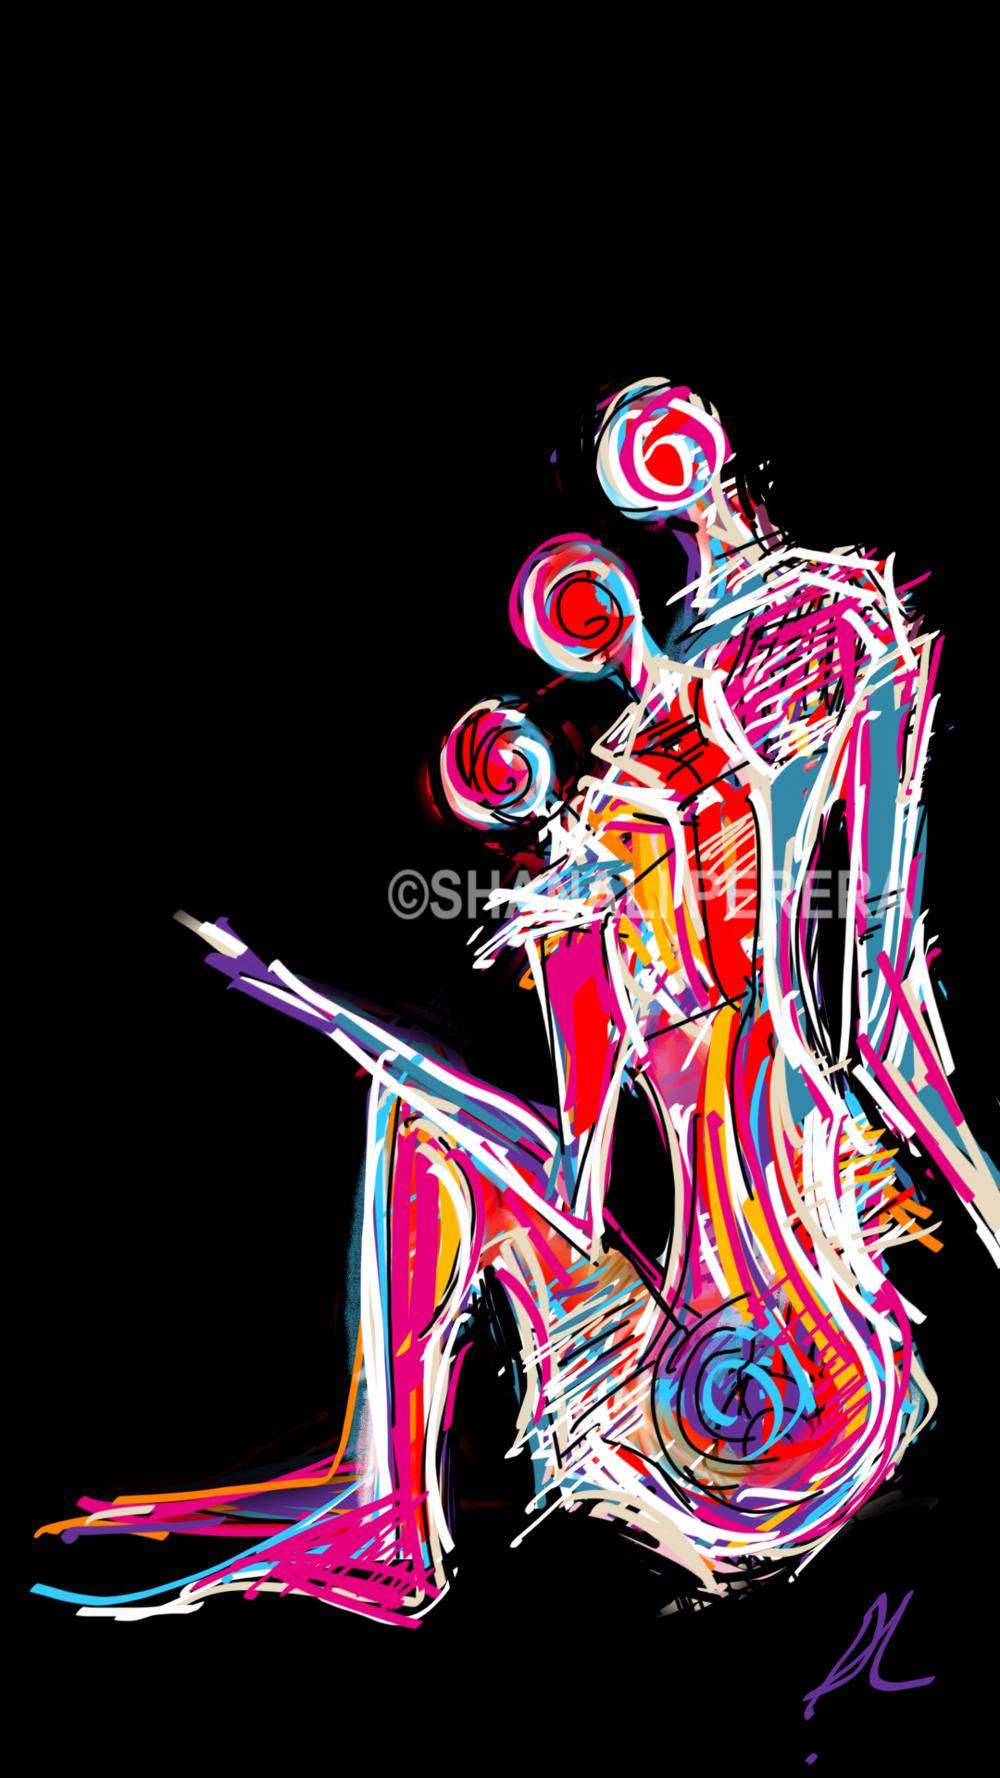 sketch-1518960851142.png